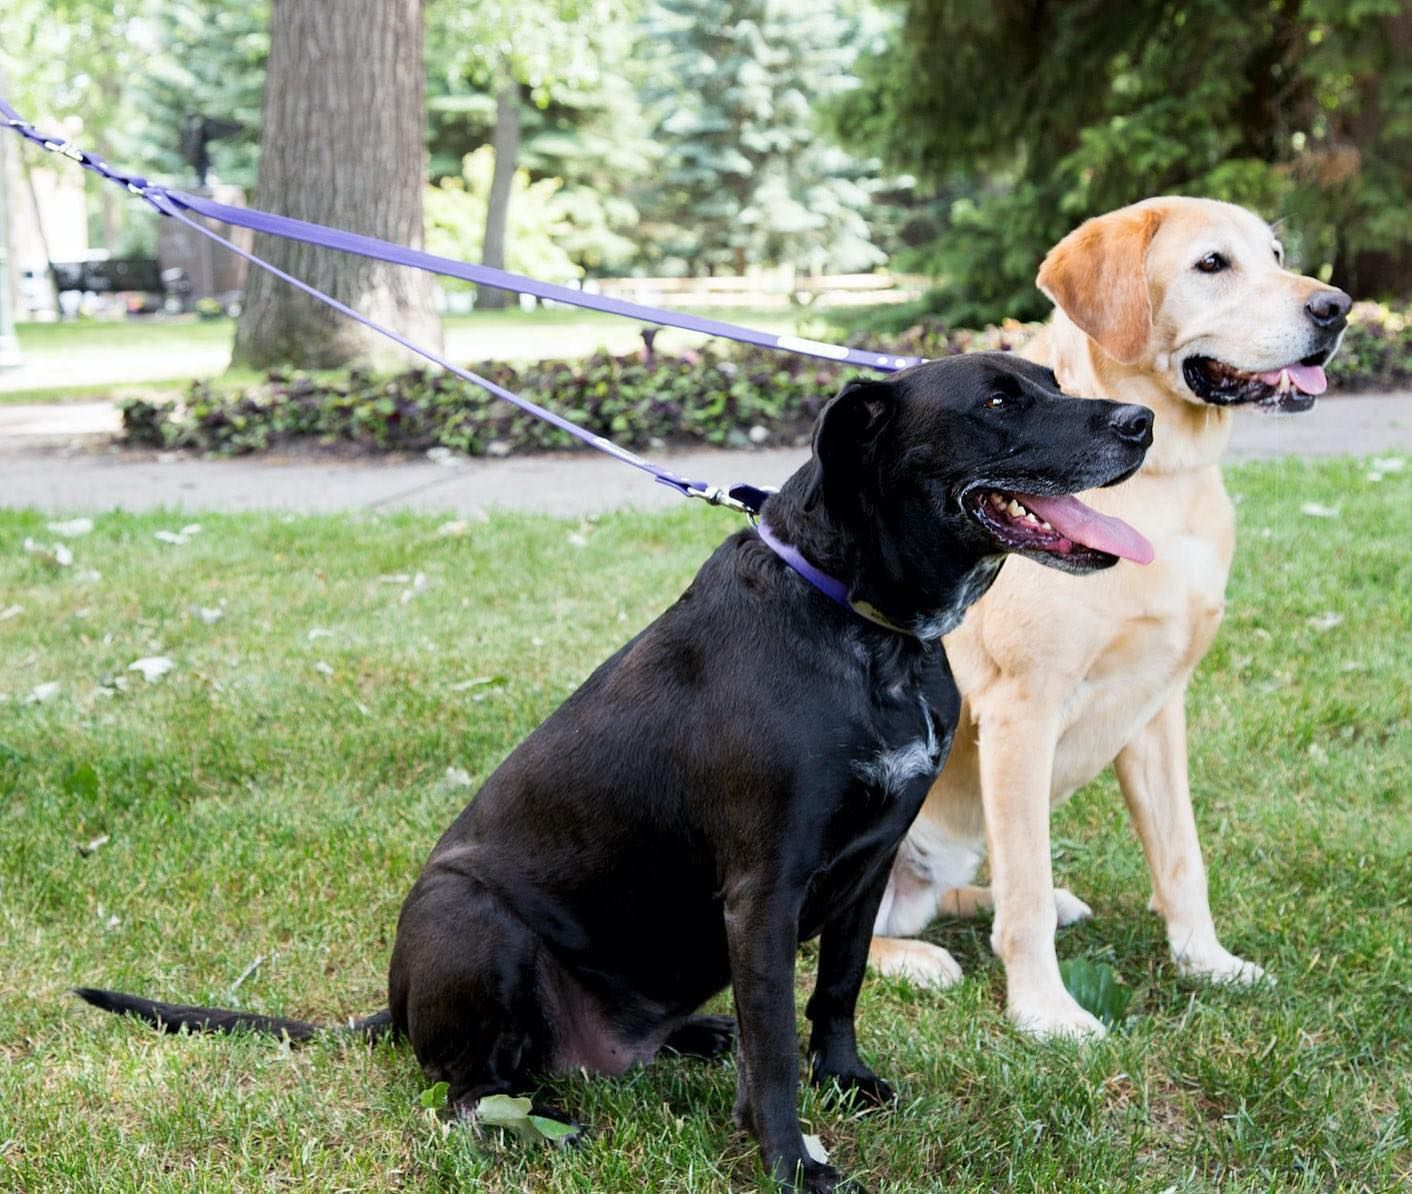 Friends Who Walk Together Stay Together Dogids Happydog Fargo Nd Fargonorthdakota Pets Dogs Happydogs Walkies Lea